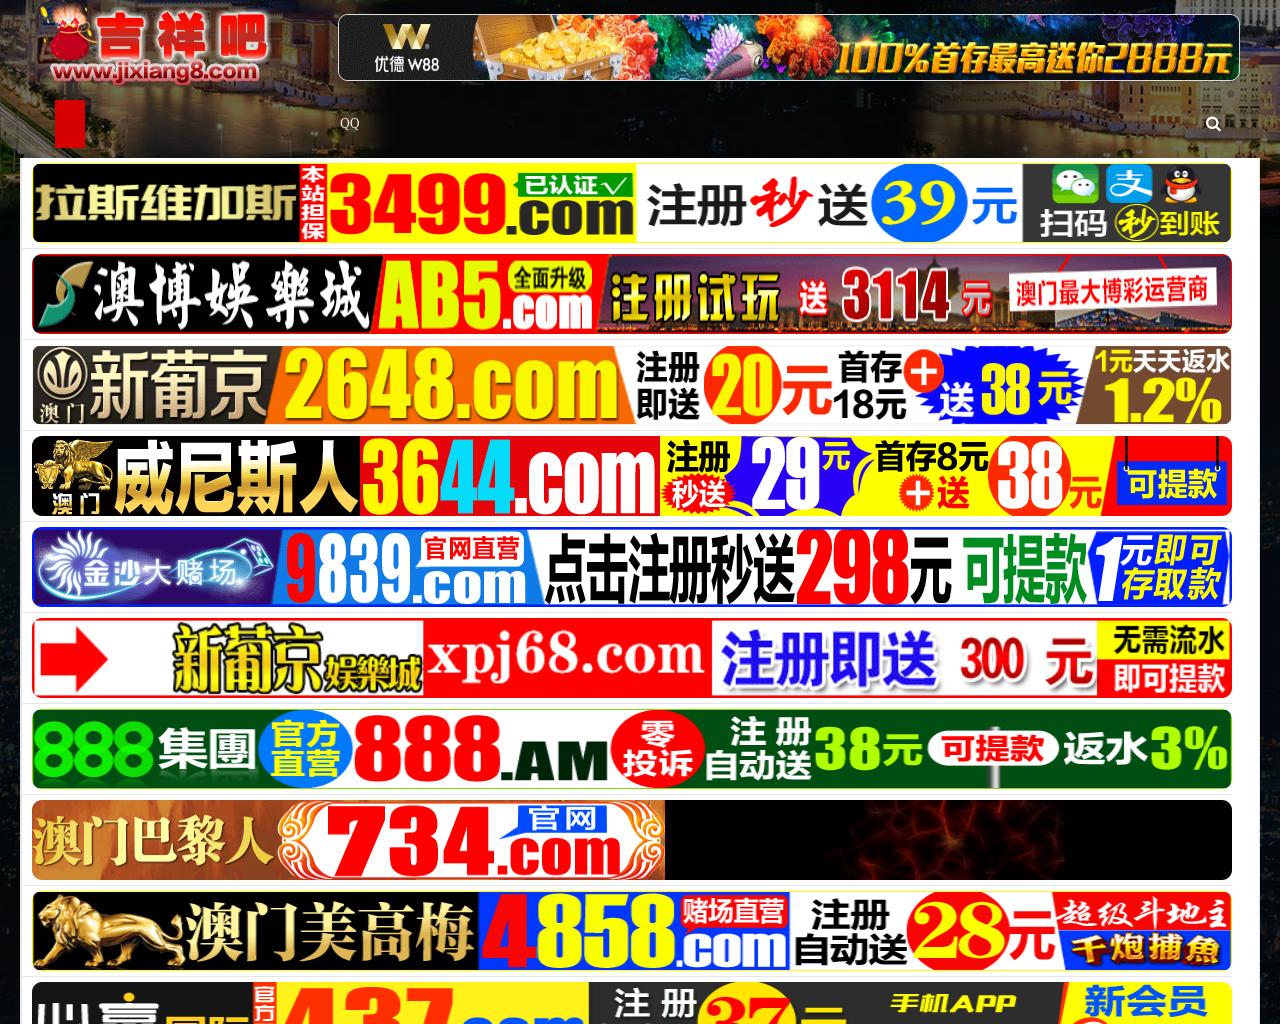 MySpaceLyts-Advertising-Reviews-Pricing